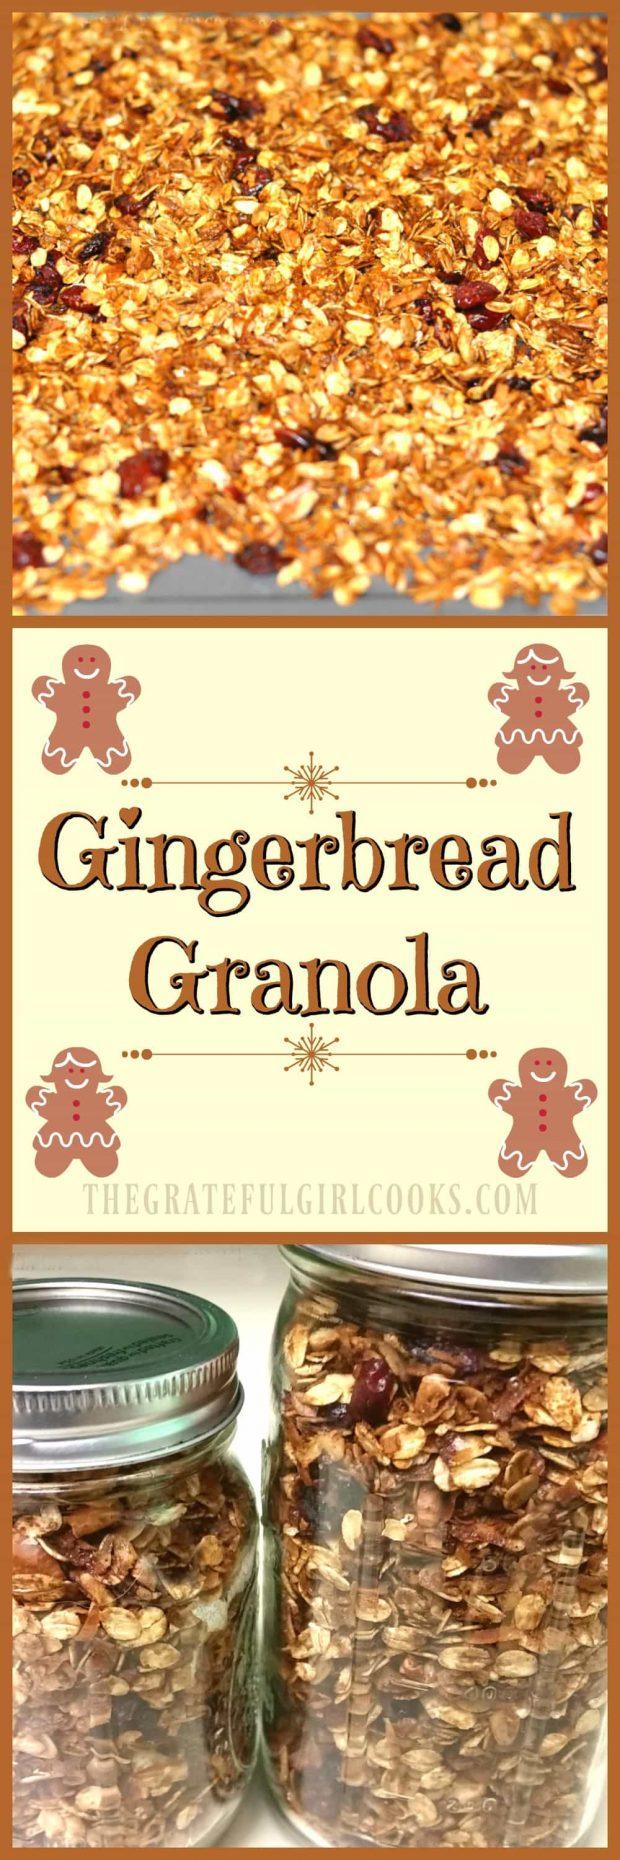 Gingerbread Granola / The Grateful Girl Cooks!